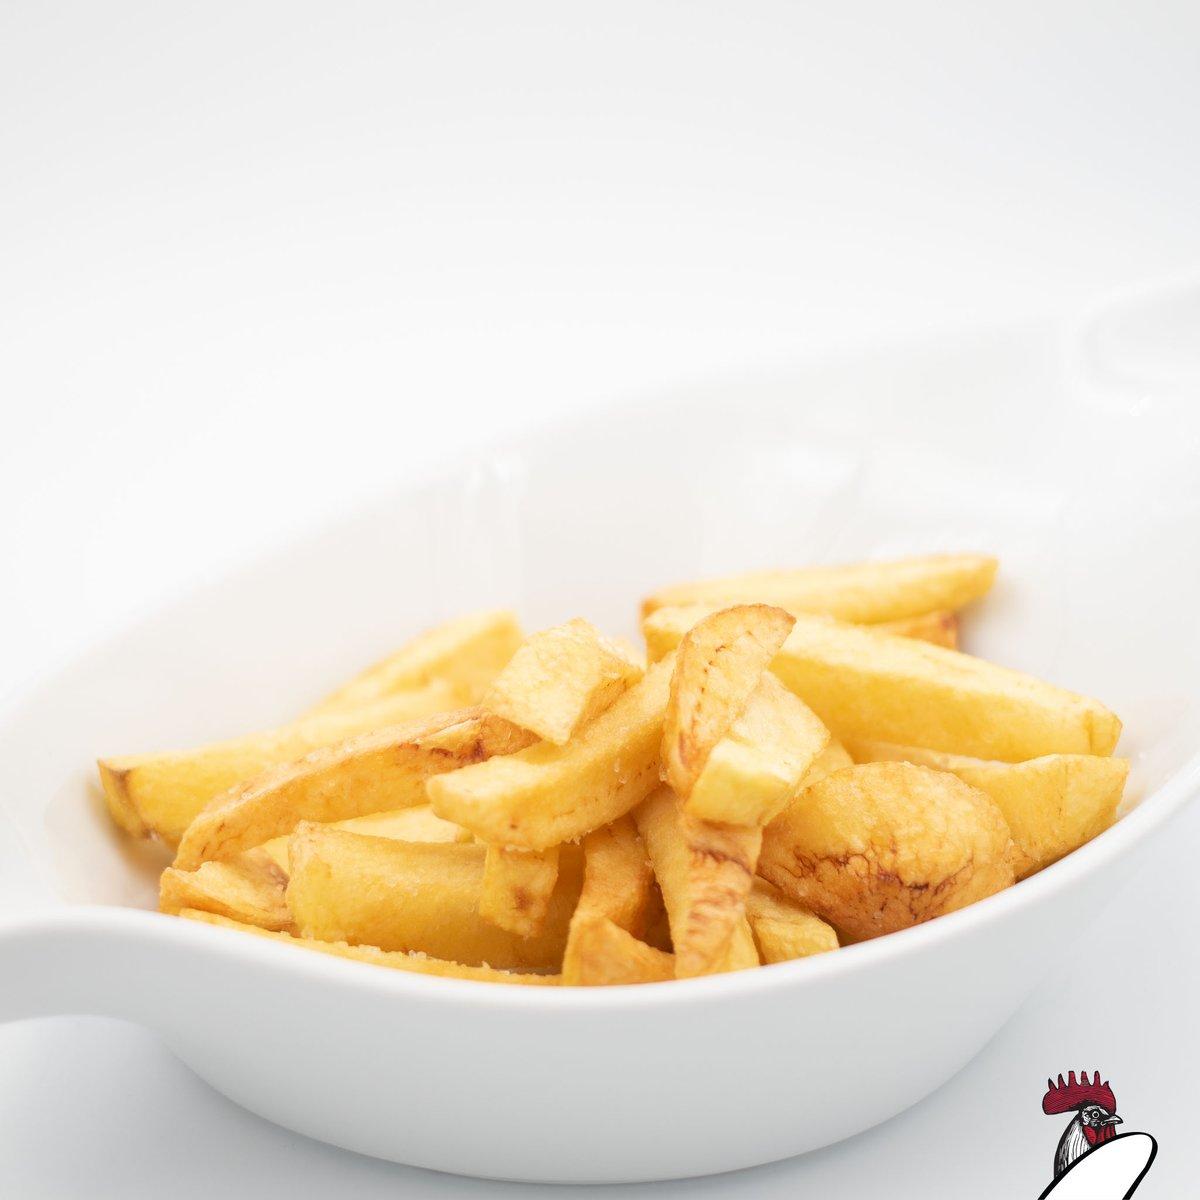 Patates naturals i ben fregides ;D #calgallrestaurant #emporda #gastrolovers #foodiesgirona #girona